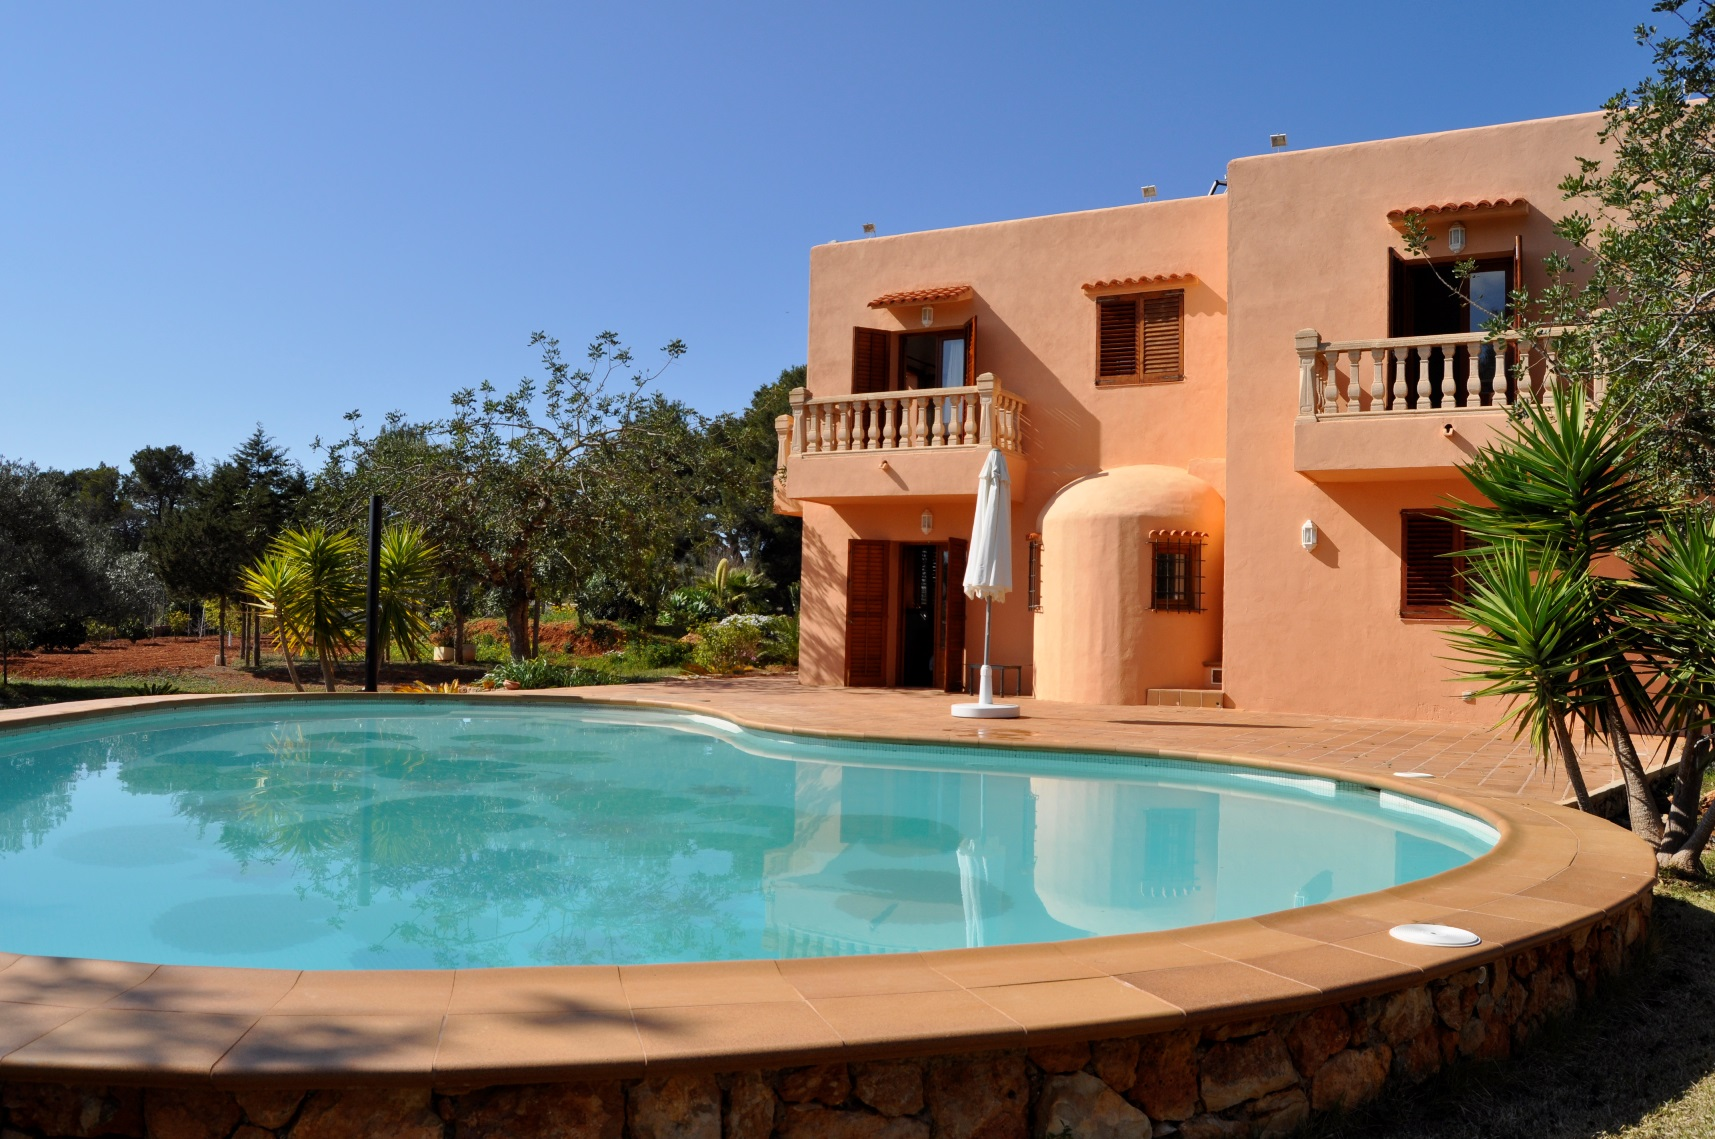 Properties for sale in ibiza luxury - Casa con piscina ...